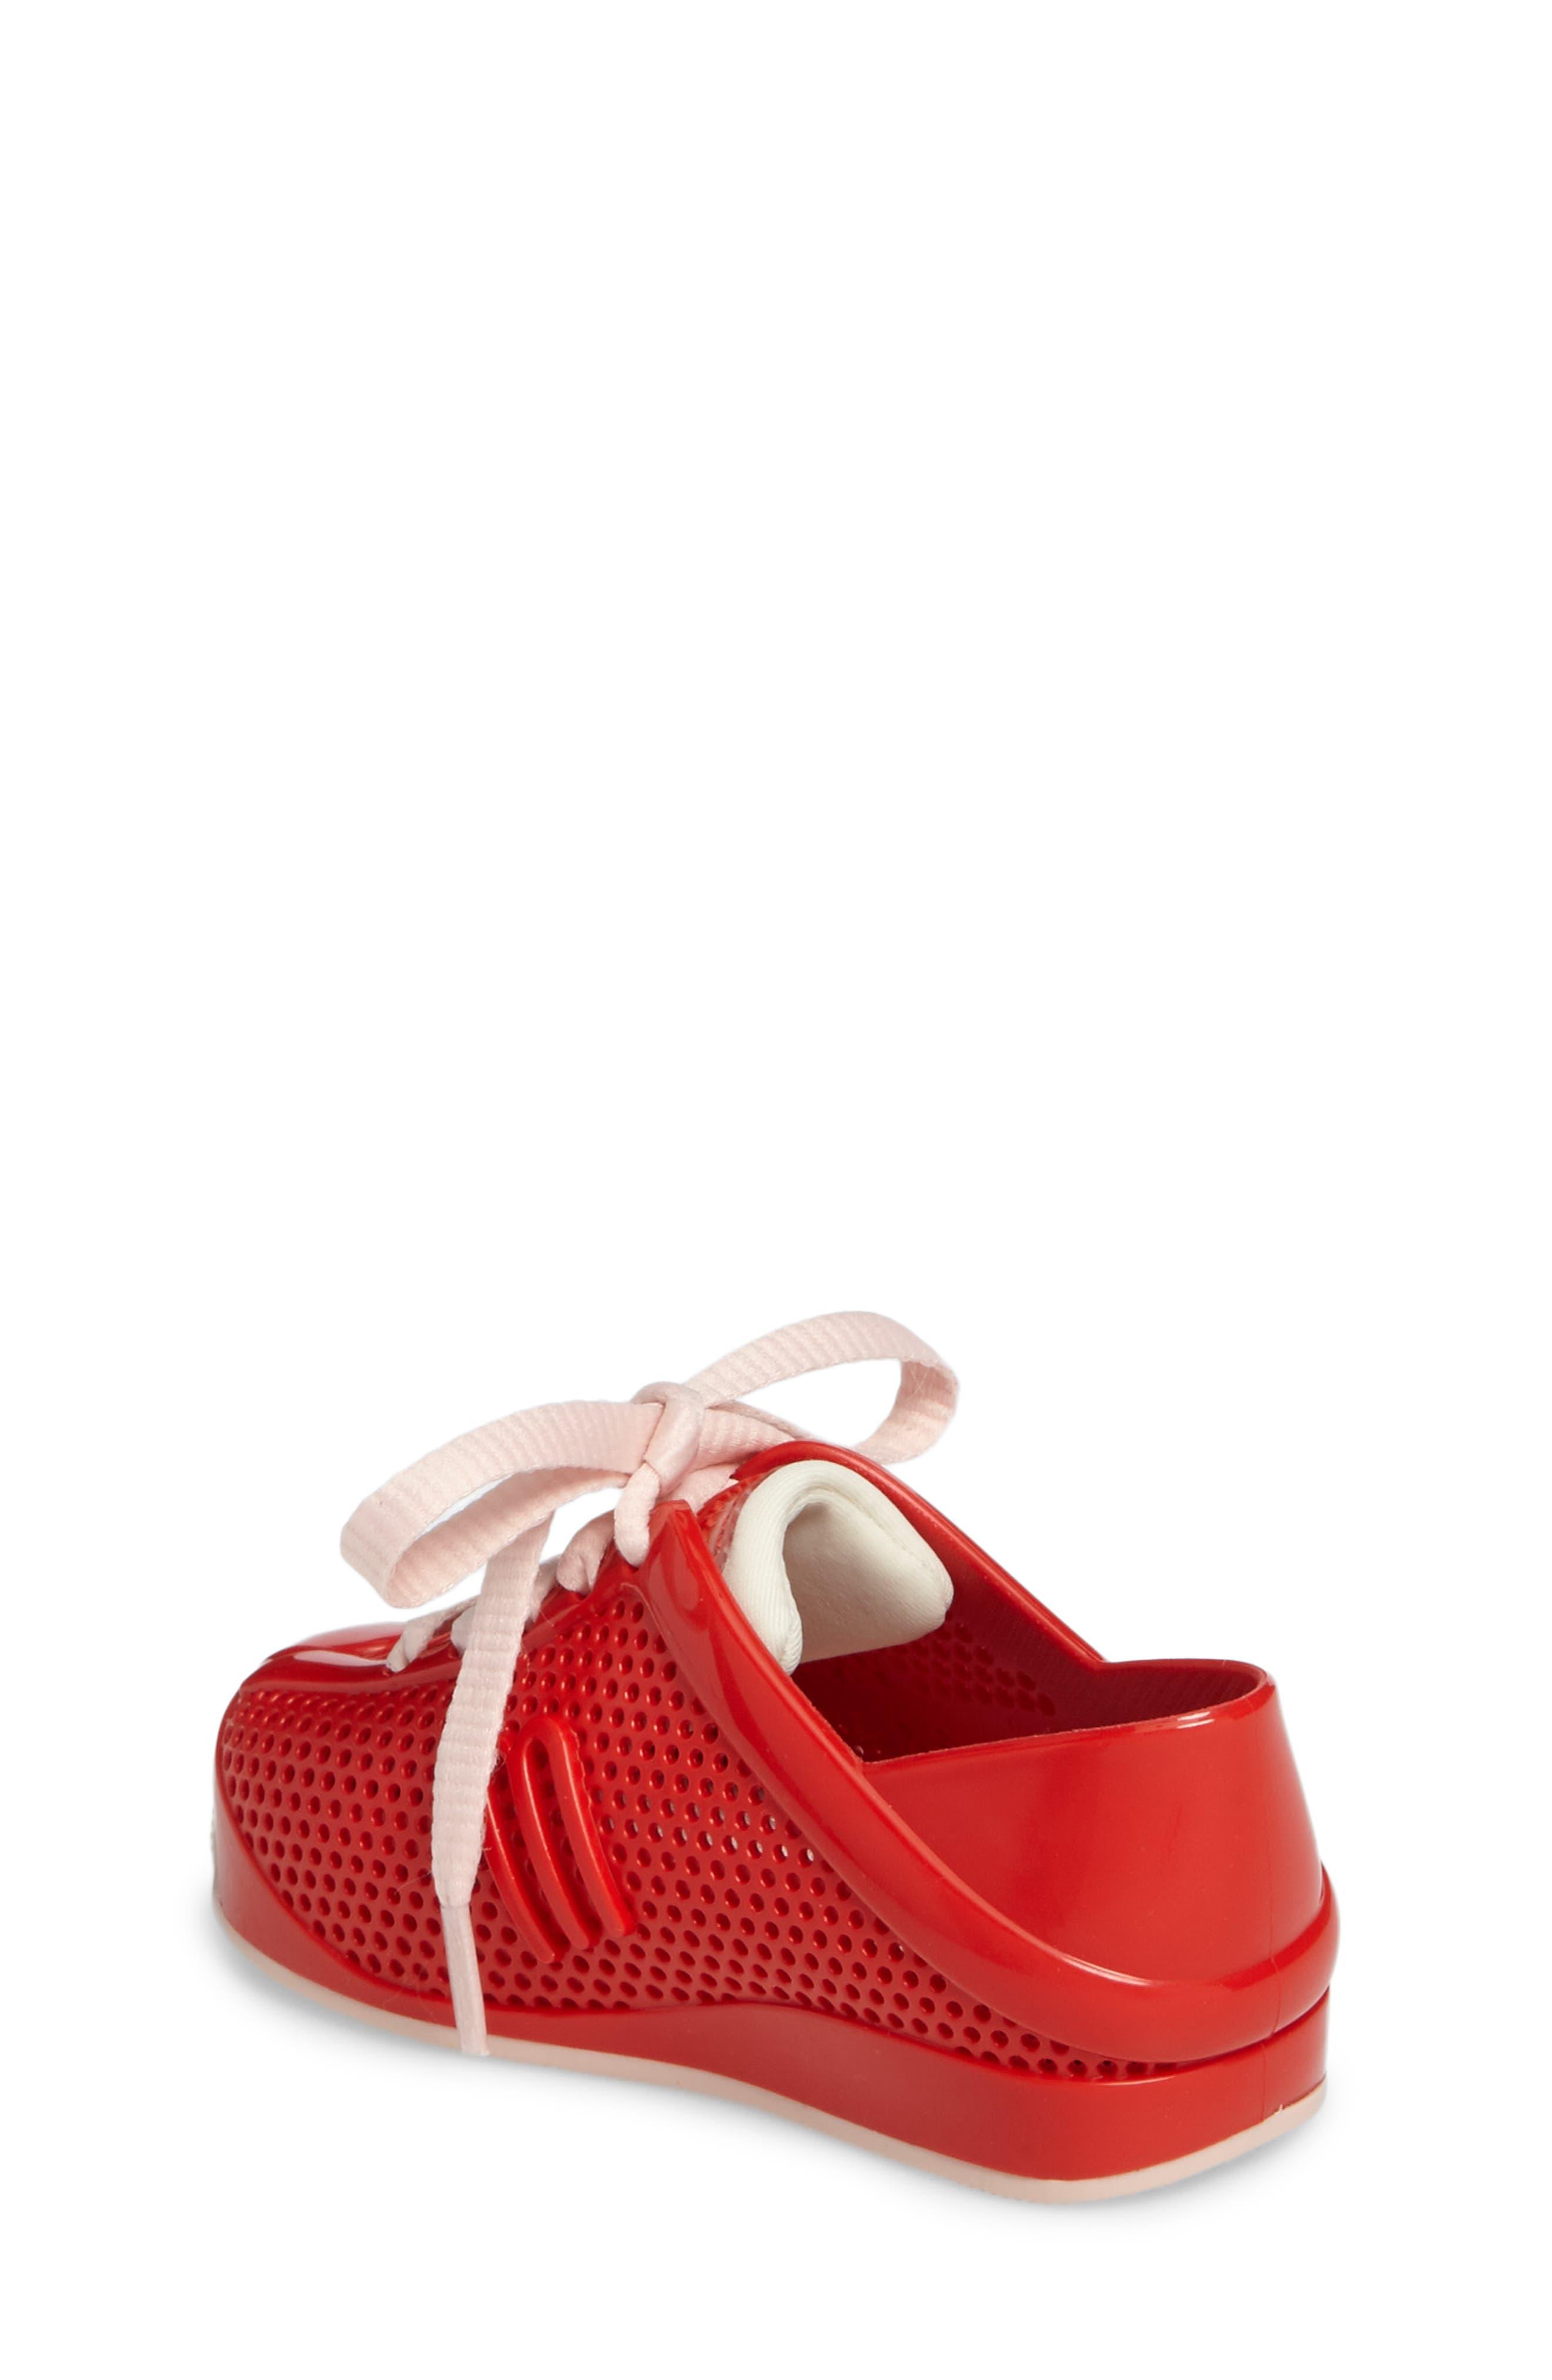 'Love System' Sneaker,                             Alternate thumbnail 2, color,                             Red